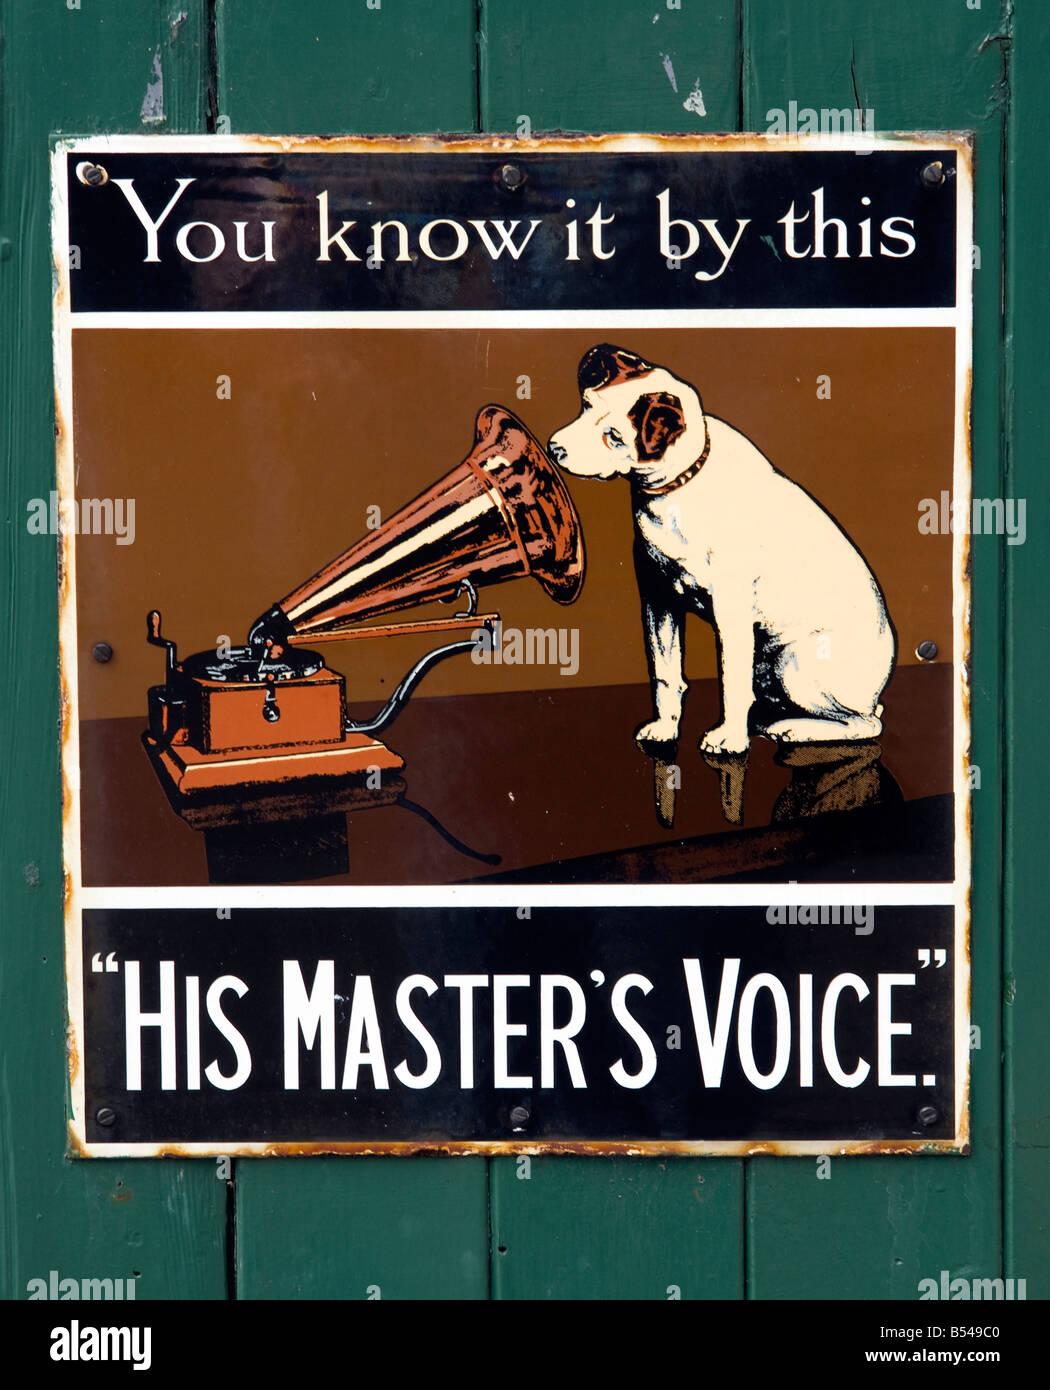 his masters voice hmv dog gramophone old advertising sign hi fi stock photo royalty free image. Black Bedroom Furniture Sets. Home Design Ideas